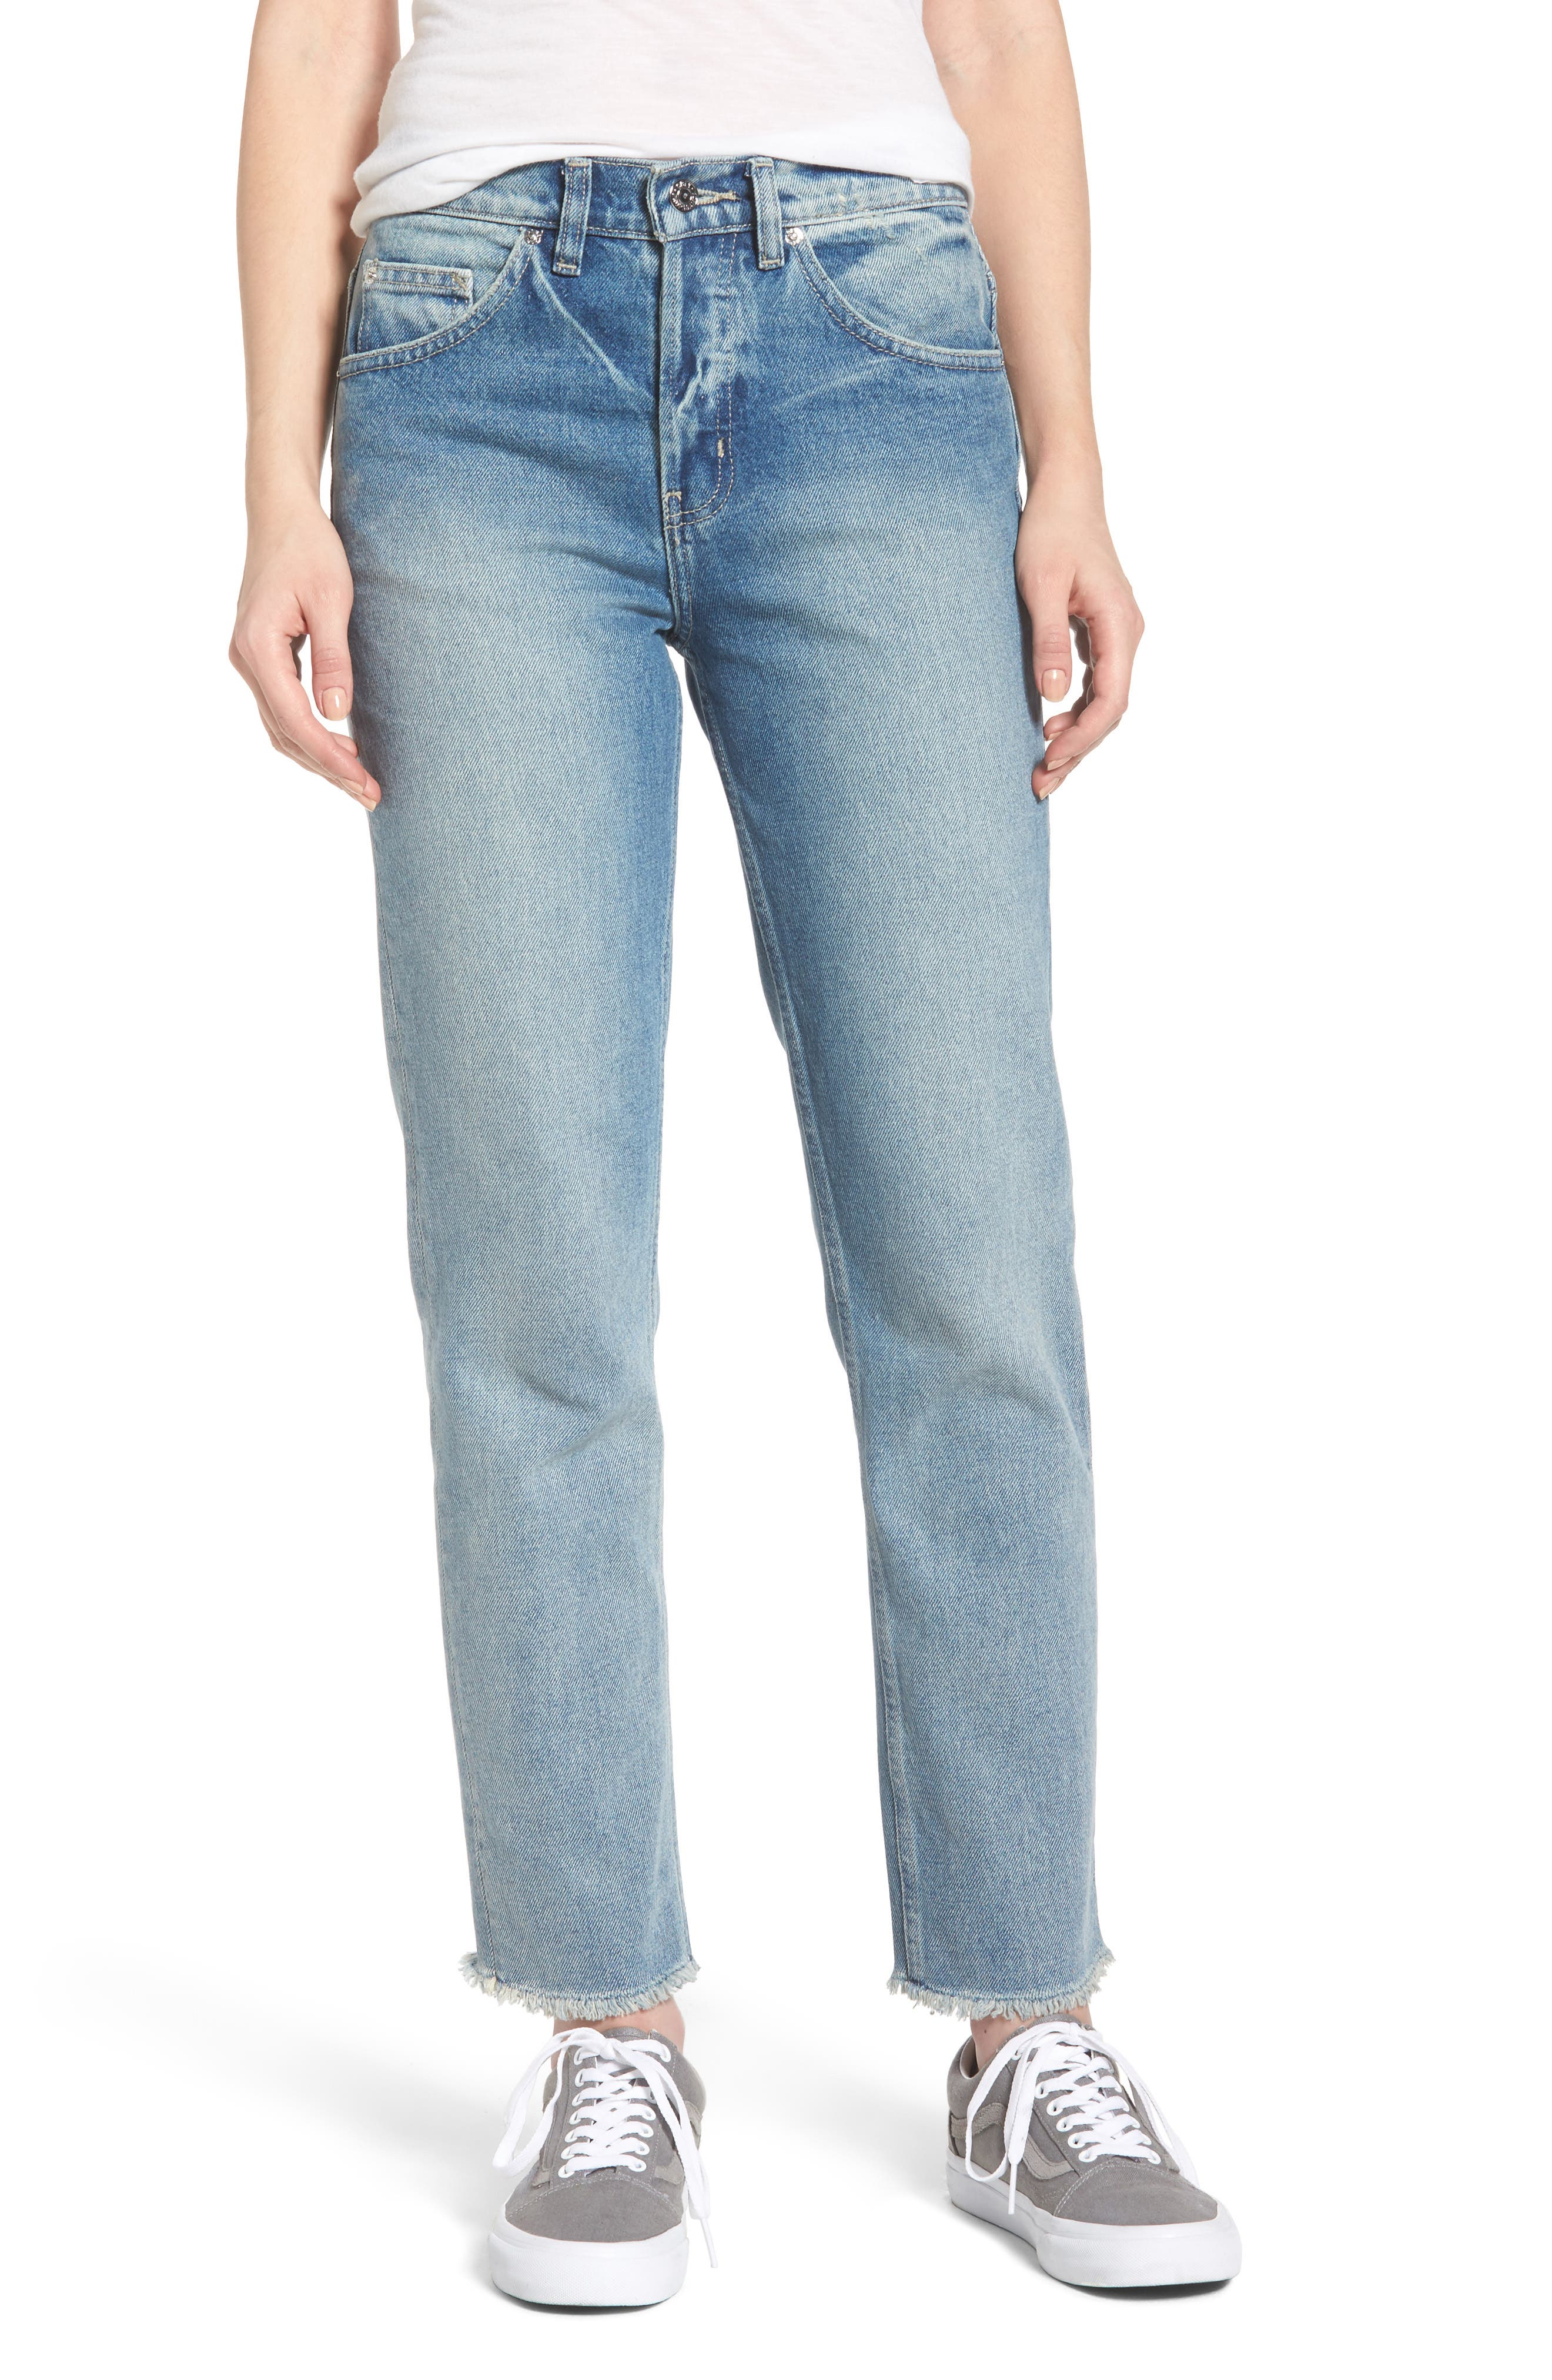 Alternate Image 1 Selected - Obey Sundays Straggler High Waist Jeans